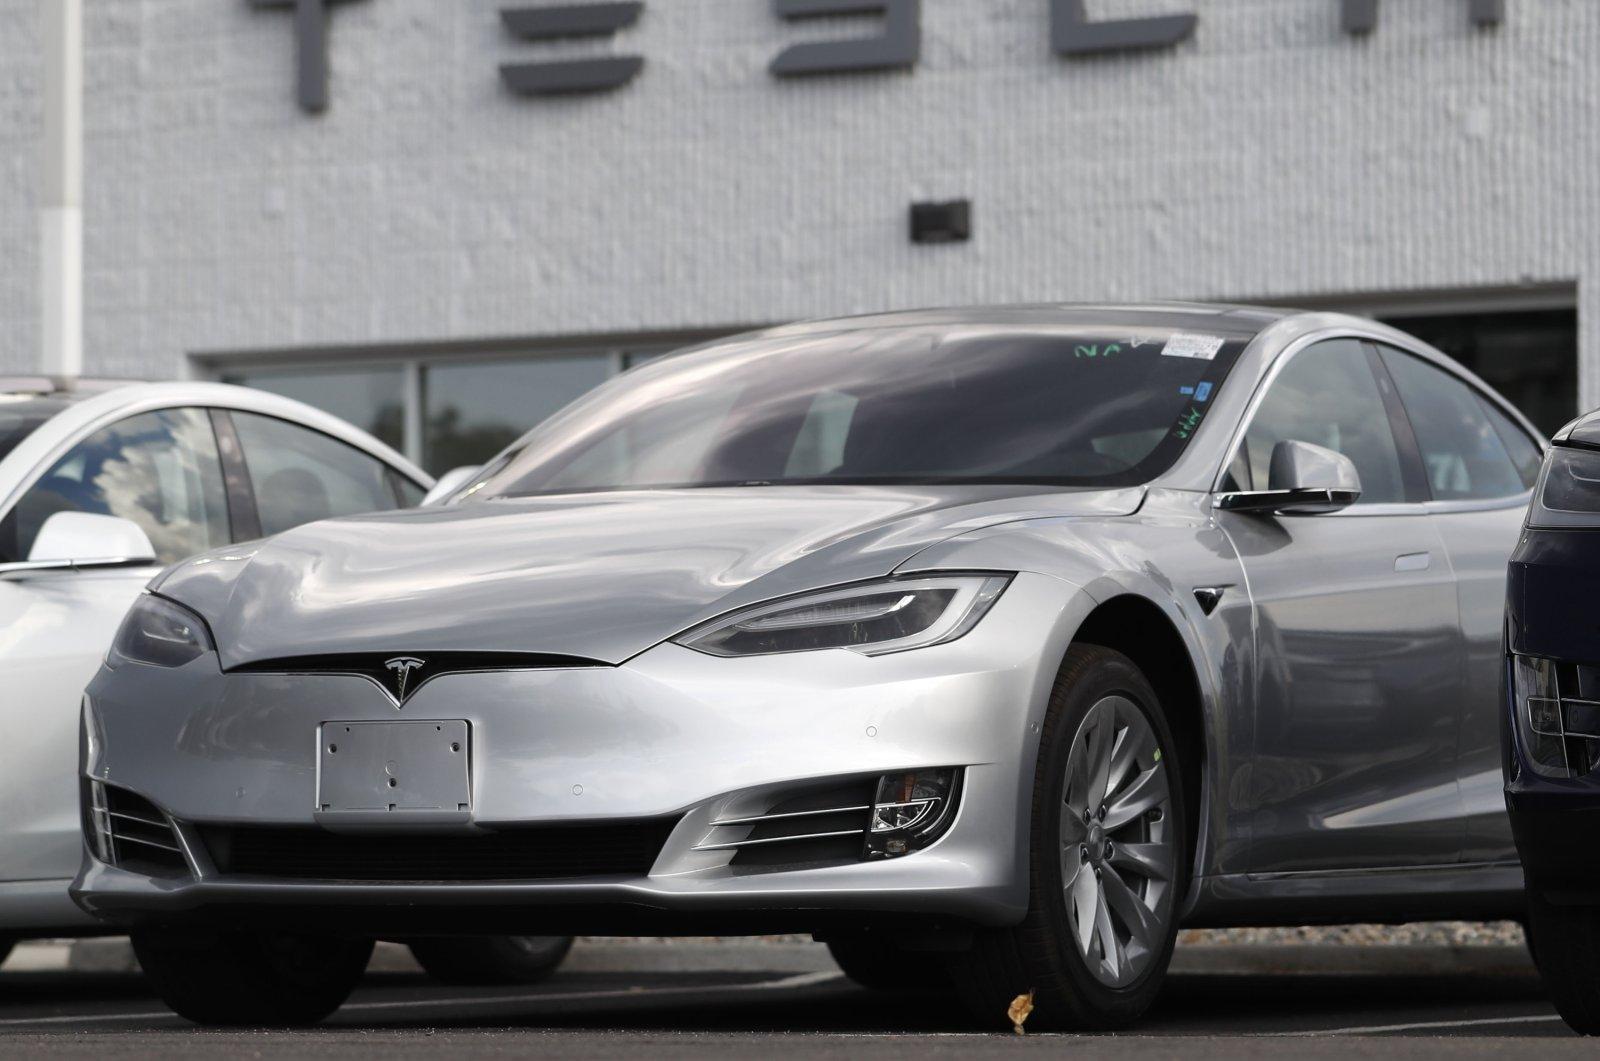 Tesla 2018 Model 3 sedans sits on display outside a Tesla showroom in Littleton, Colorado, U.S., July 8, 2018. (AP Photo)